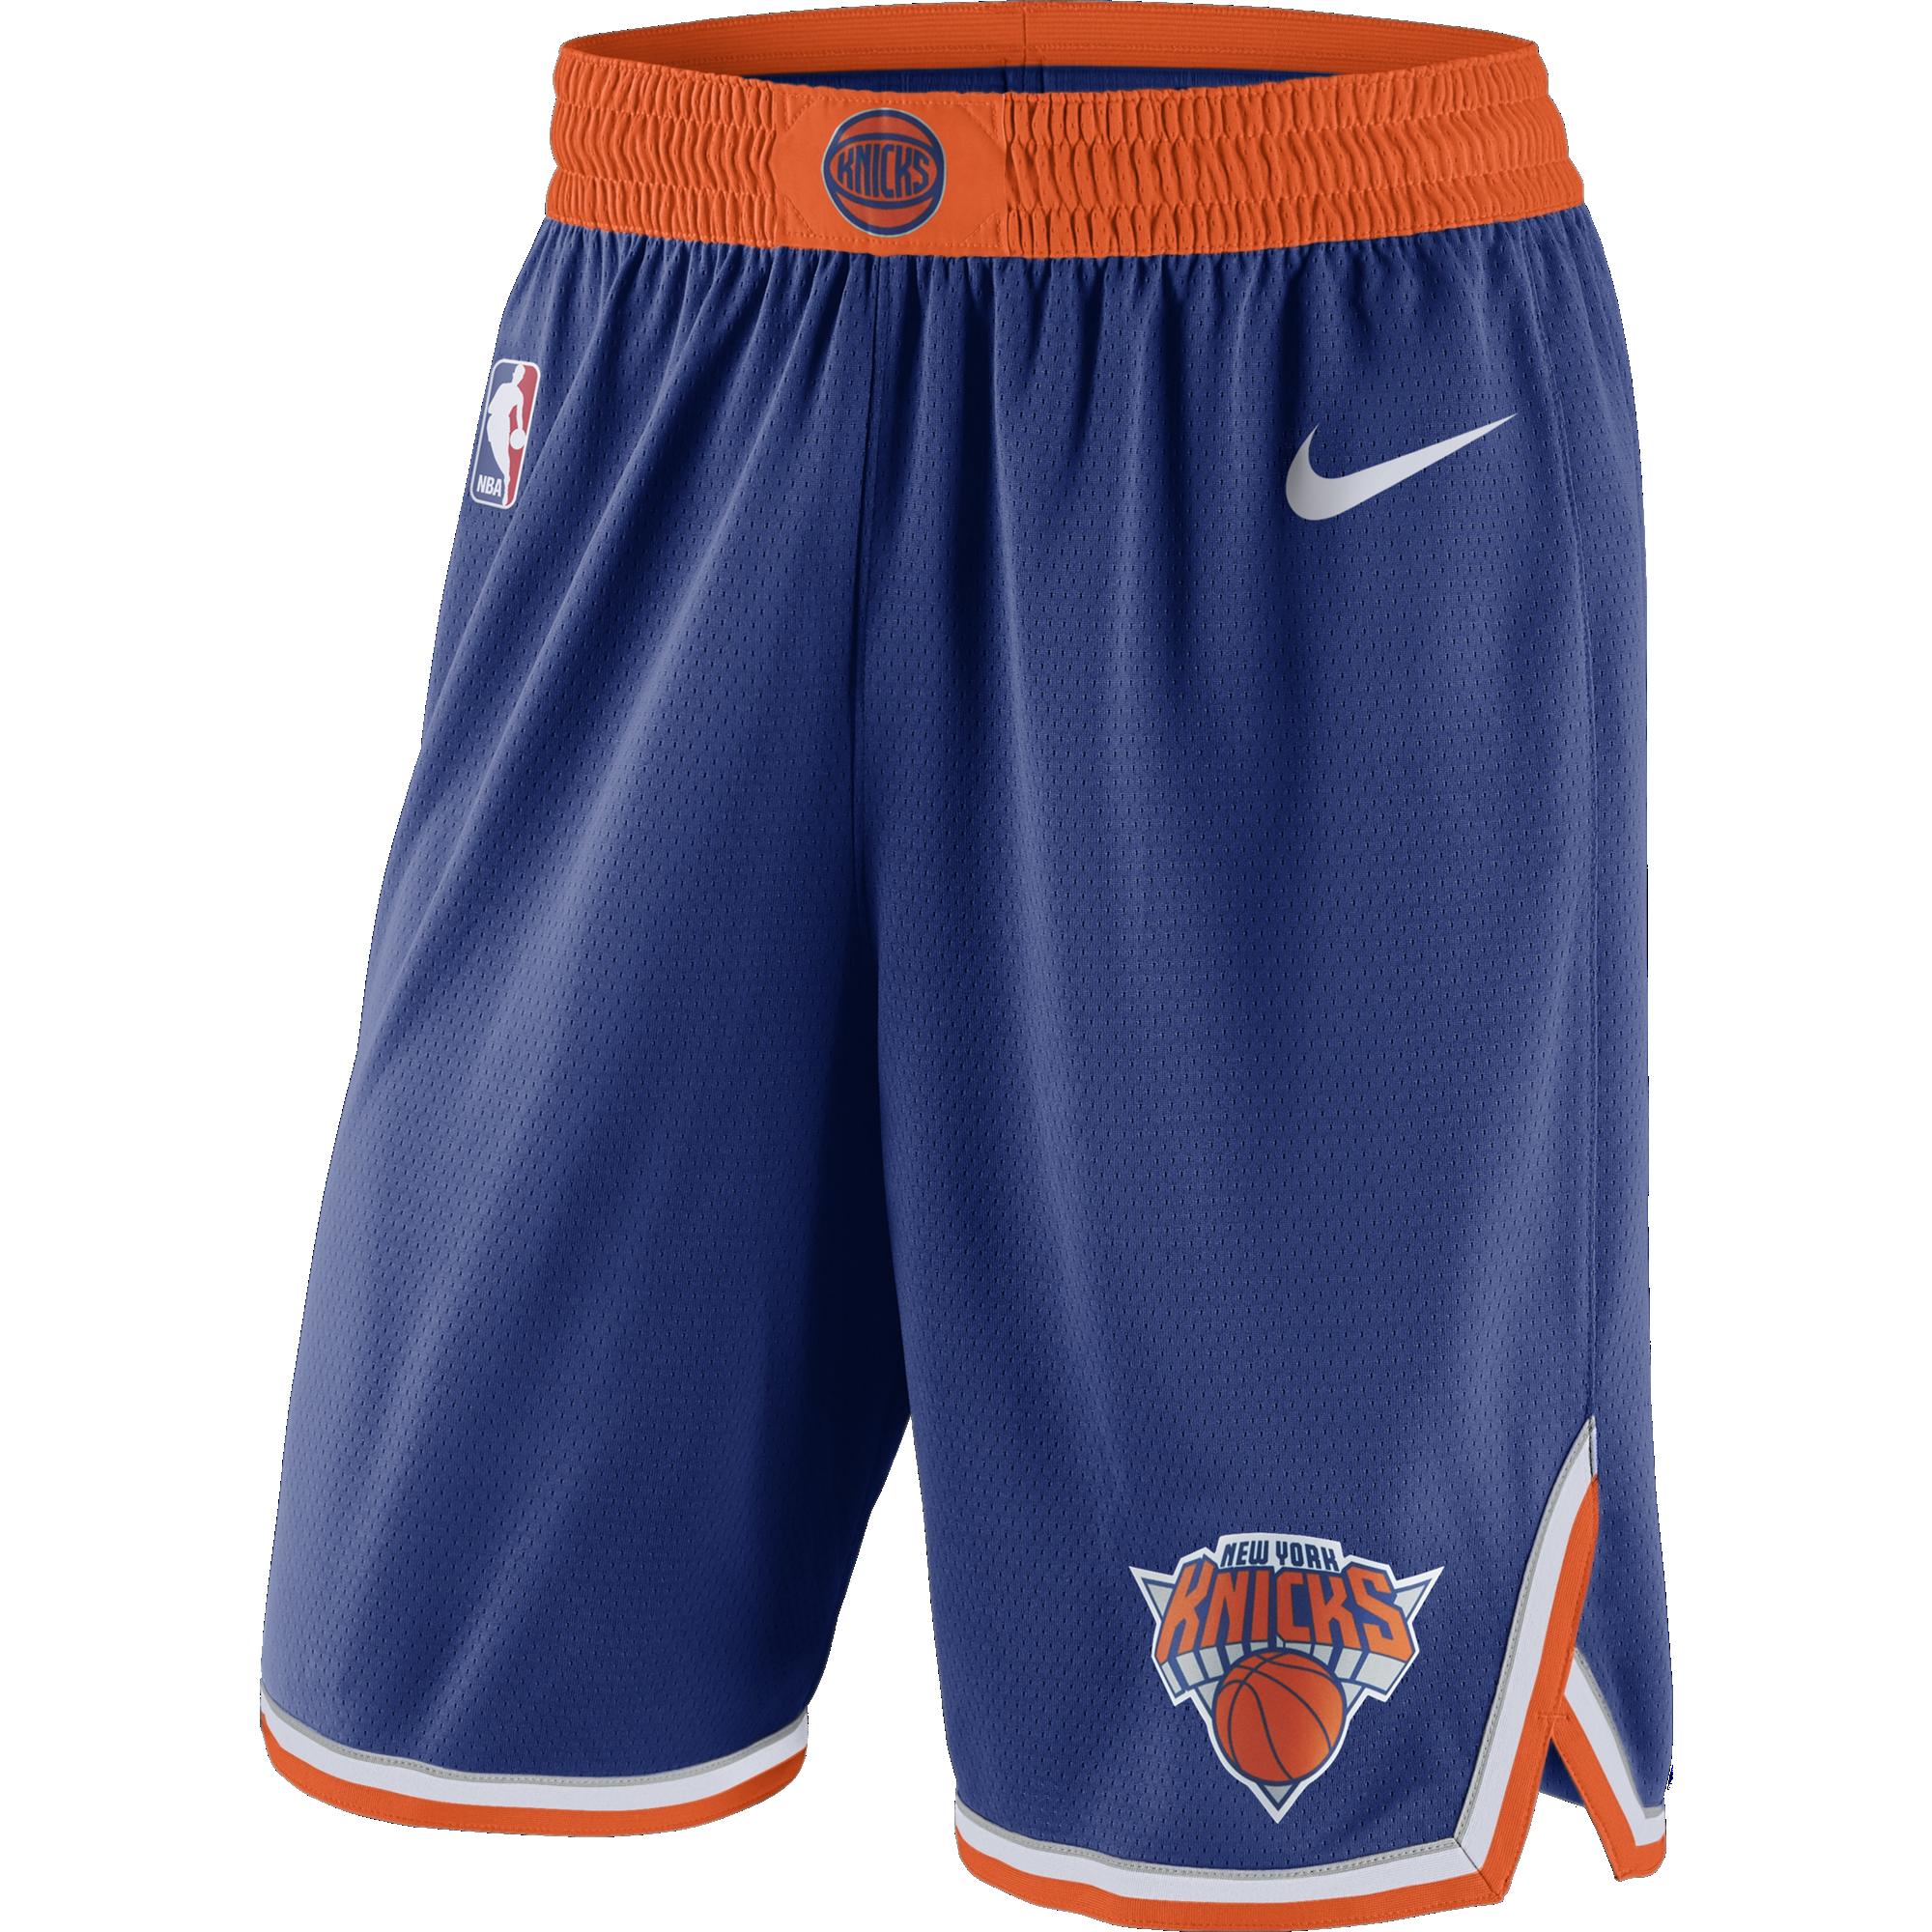 NIKE NBA NEW YORK KNICKS SWINGMAN SHORTS ROAD